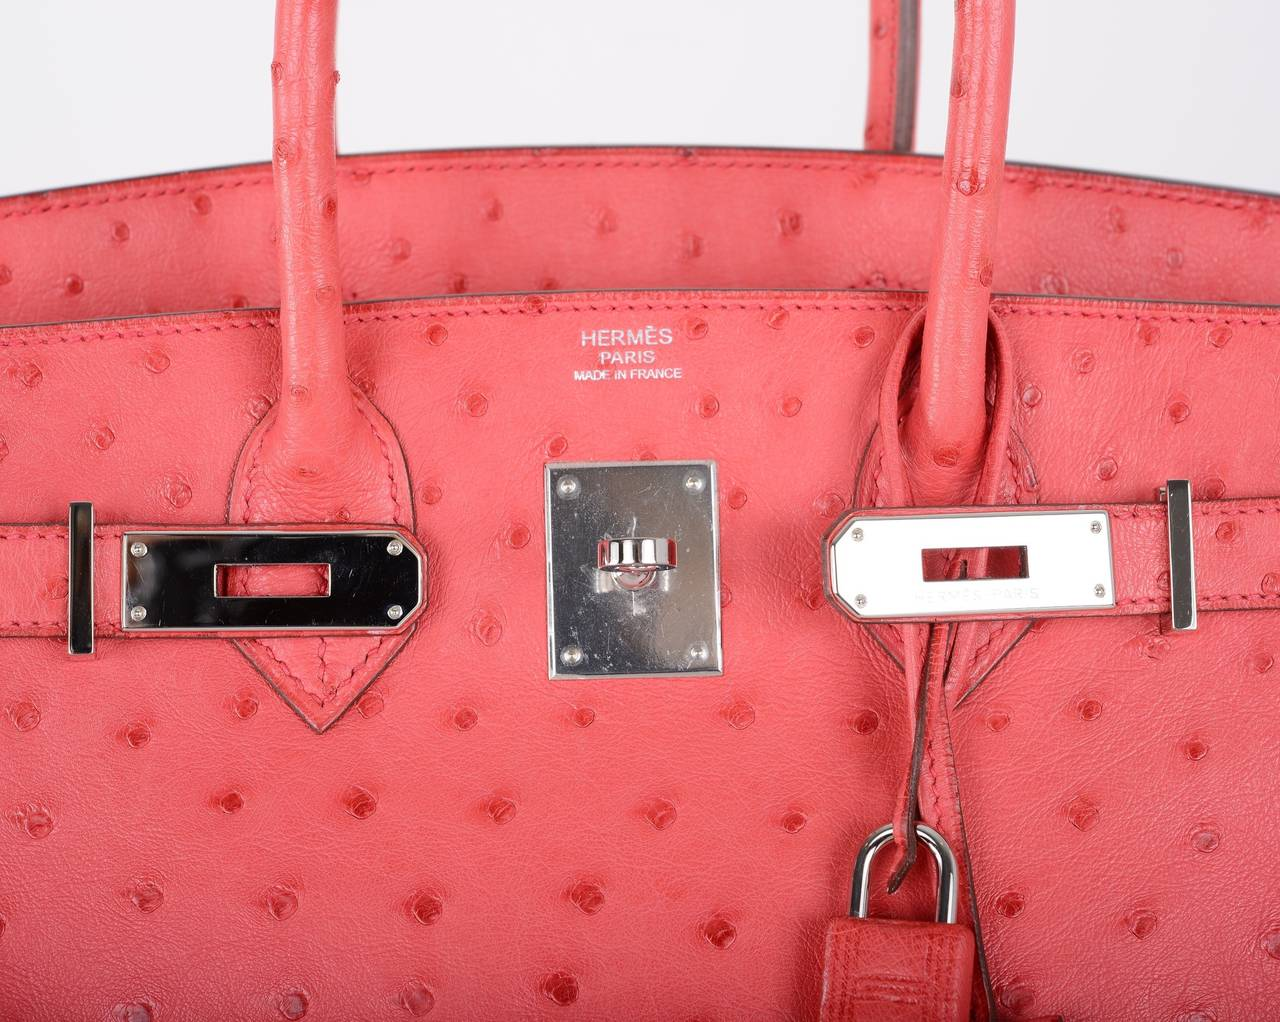 kelly wallet hermes - AMAZING HERMES BIRKIN BAG BOUGENVILLE OSTRICH and PALLADIUM 30cm ...